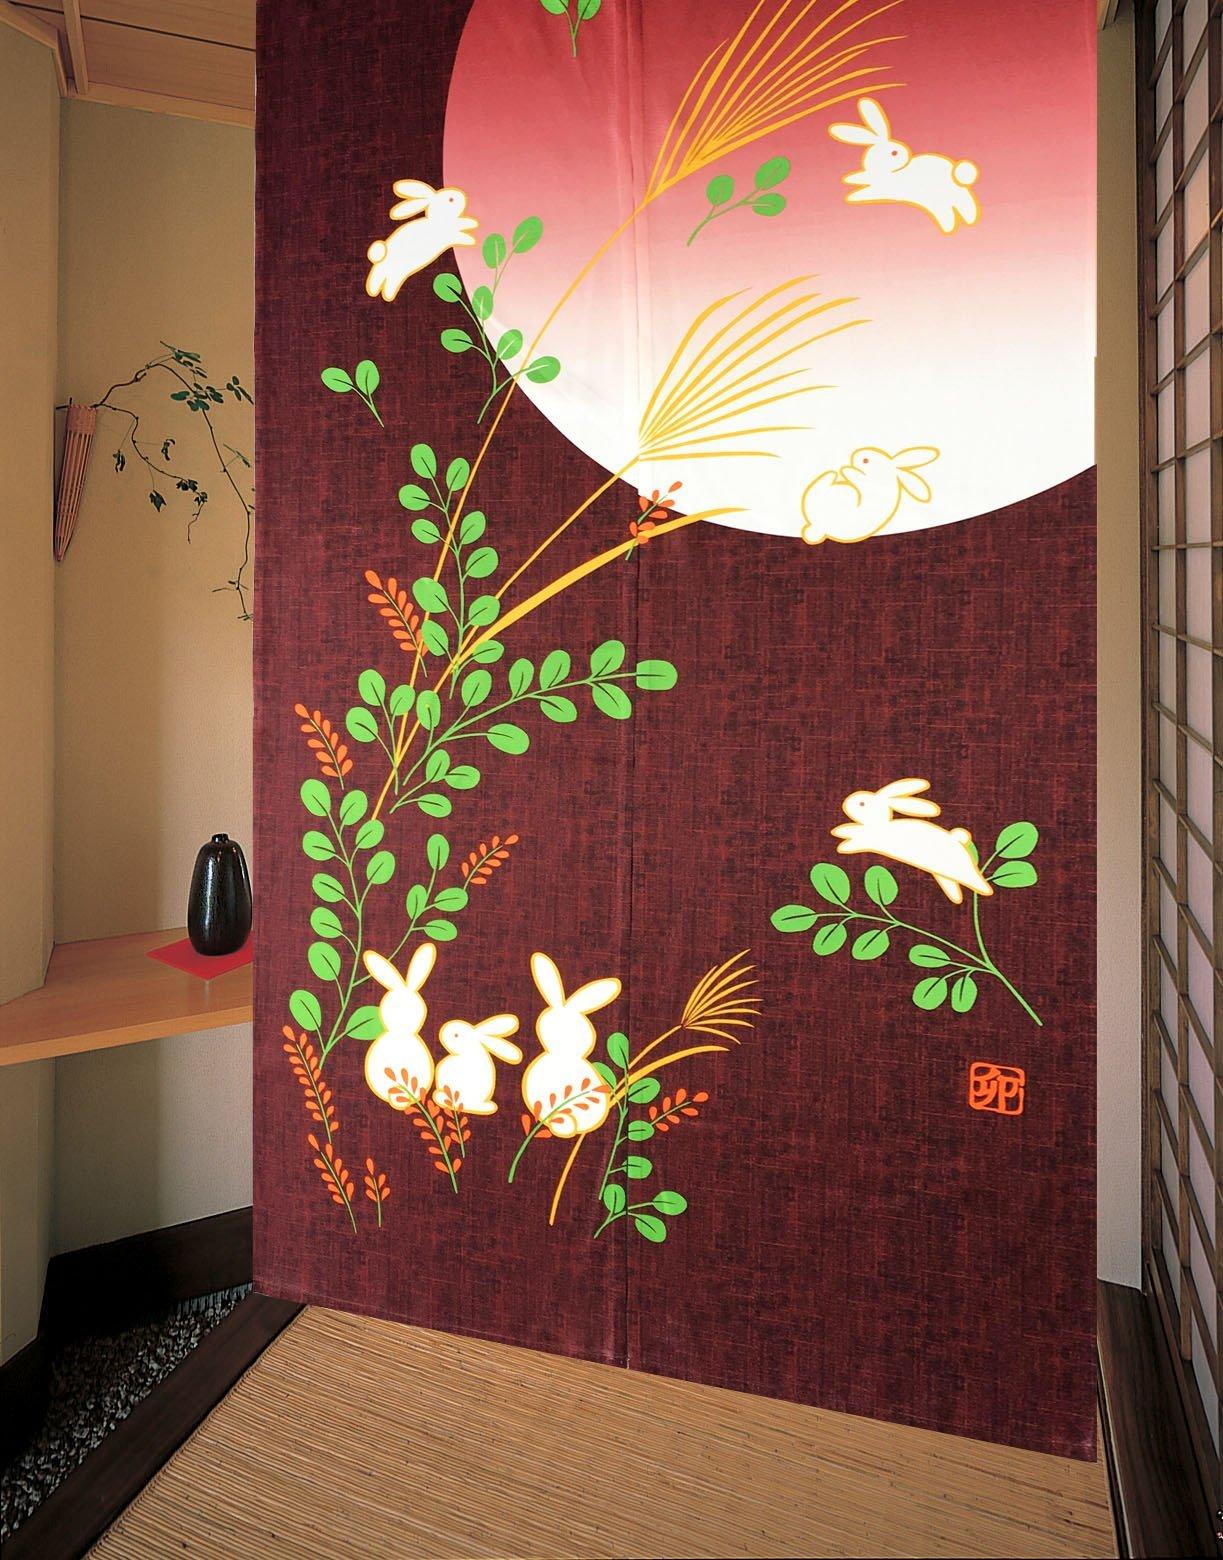 LifEast Japanese Noren Cute Running Rabbits Under Full Moon Kawaii Door Curtain (Red) by LifEast